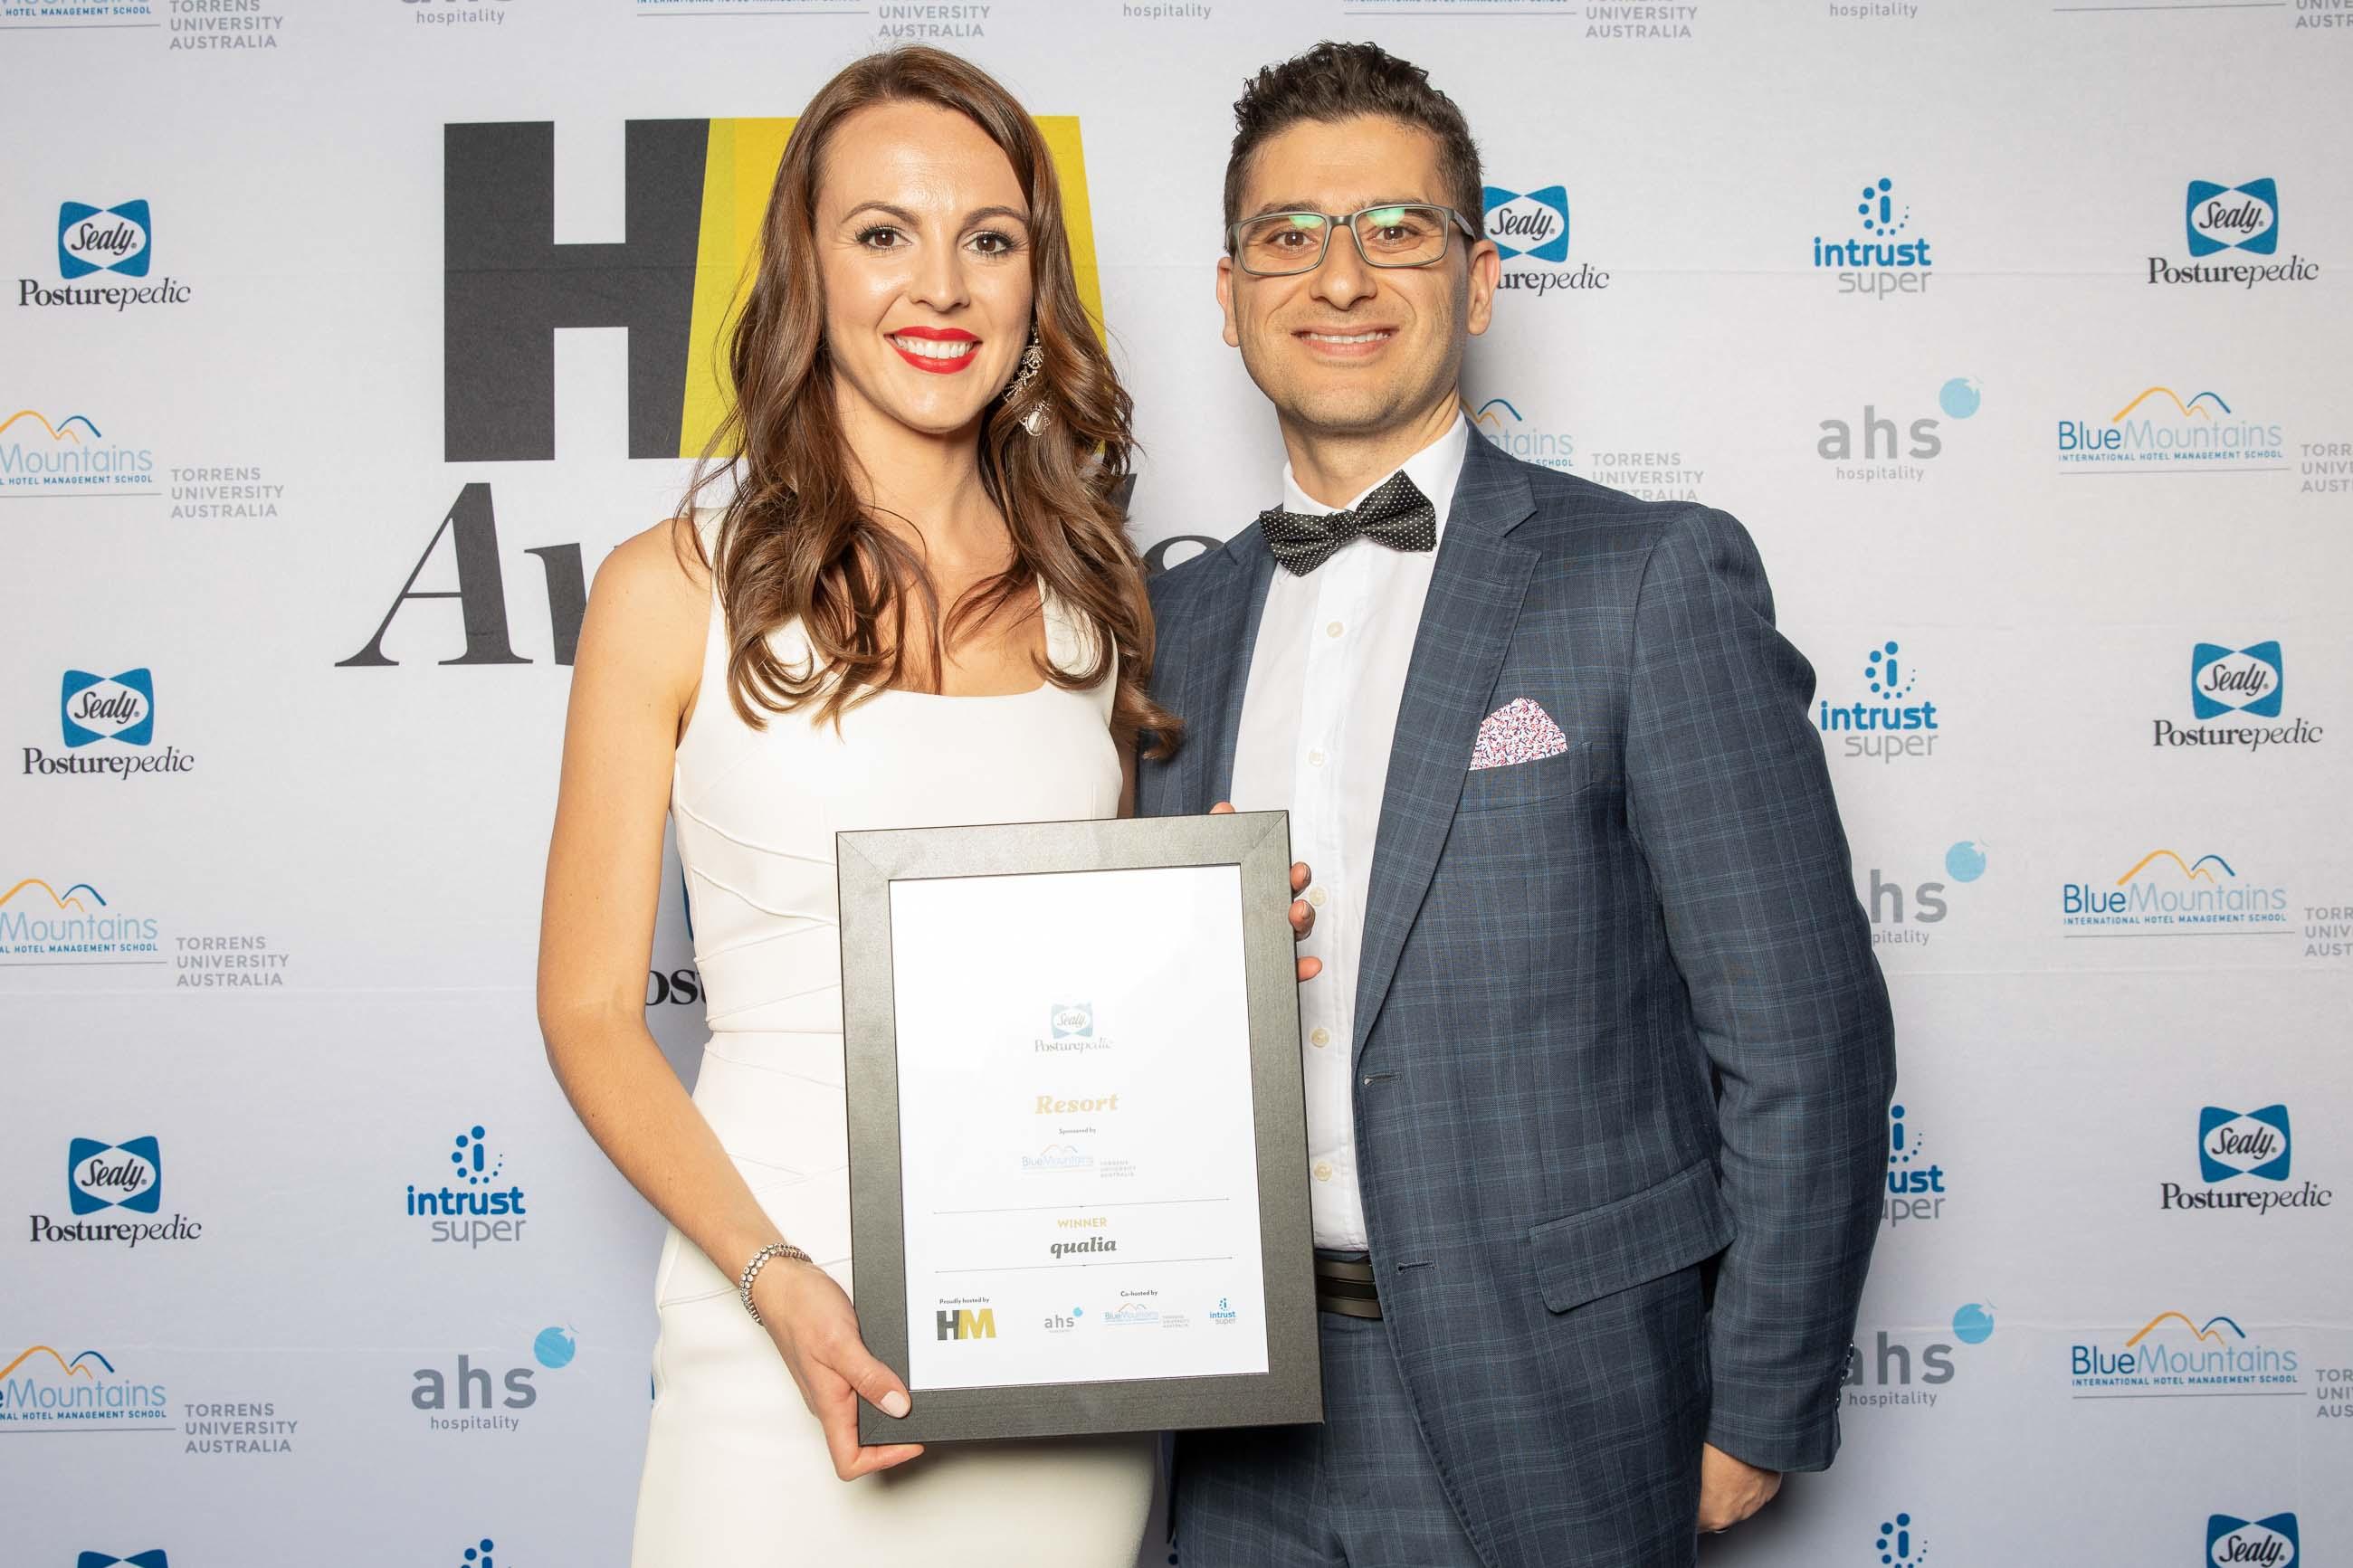 72ppi-HMawards-2018-official-award-wall-5050